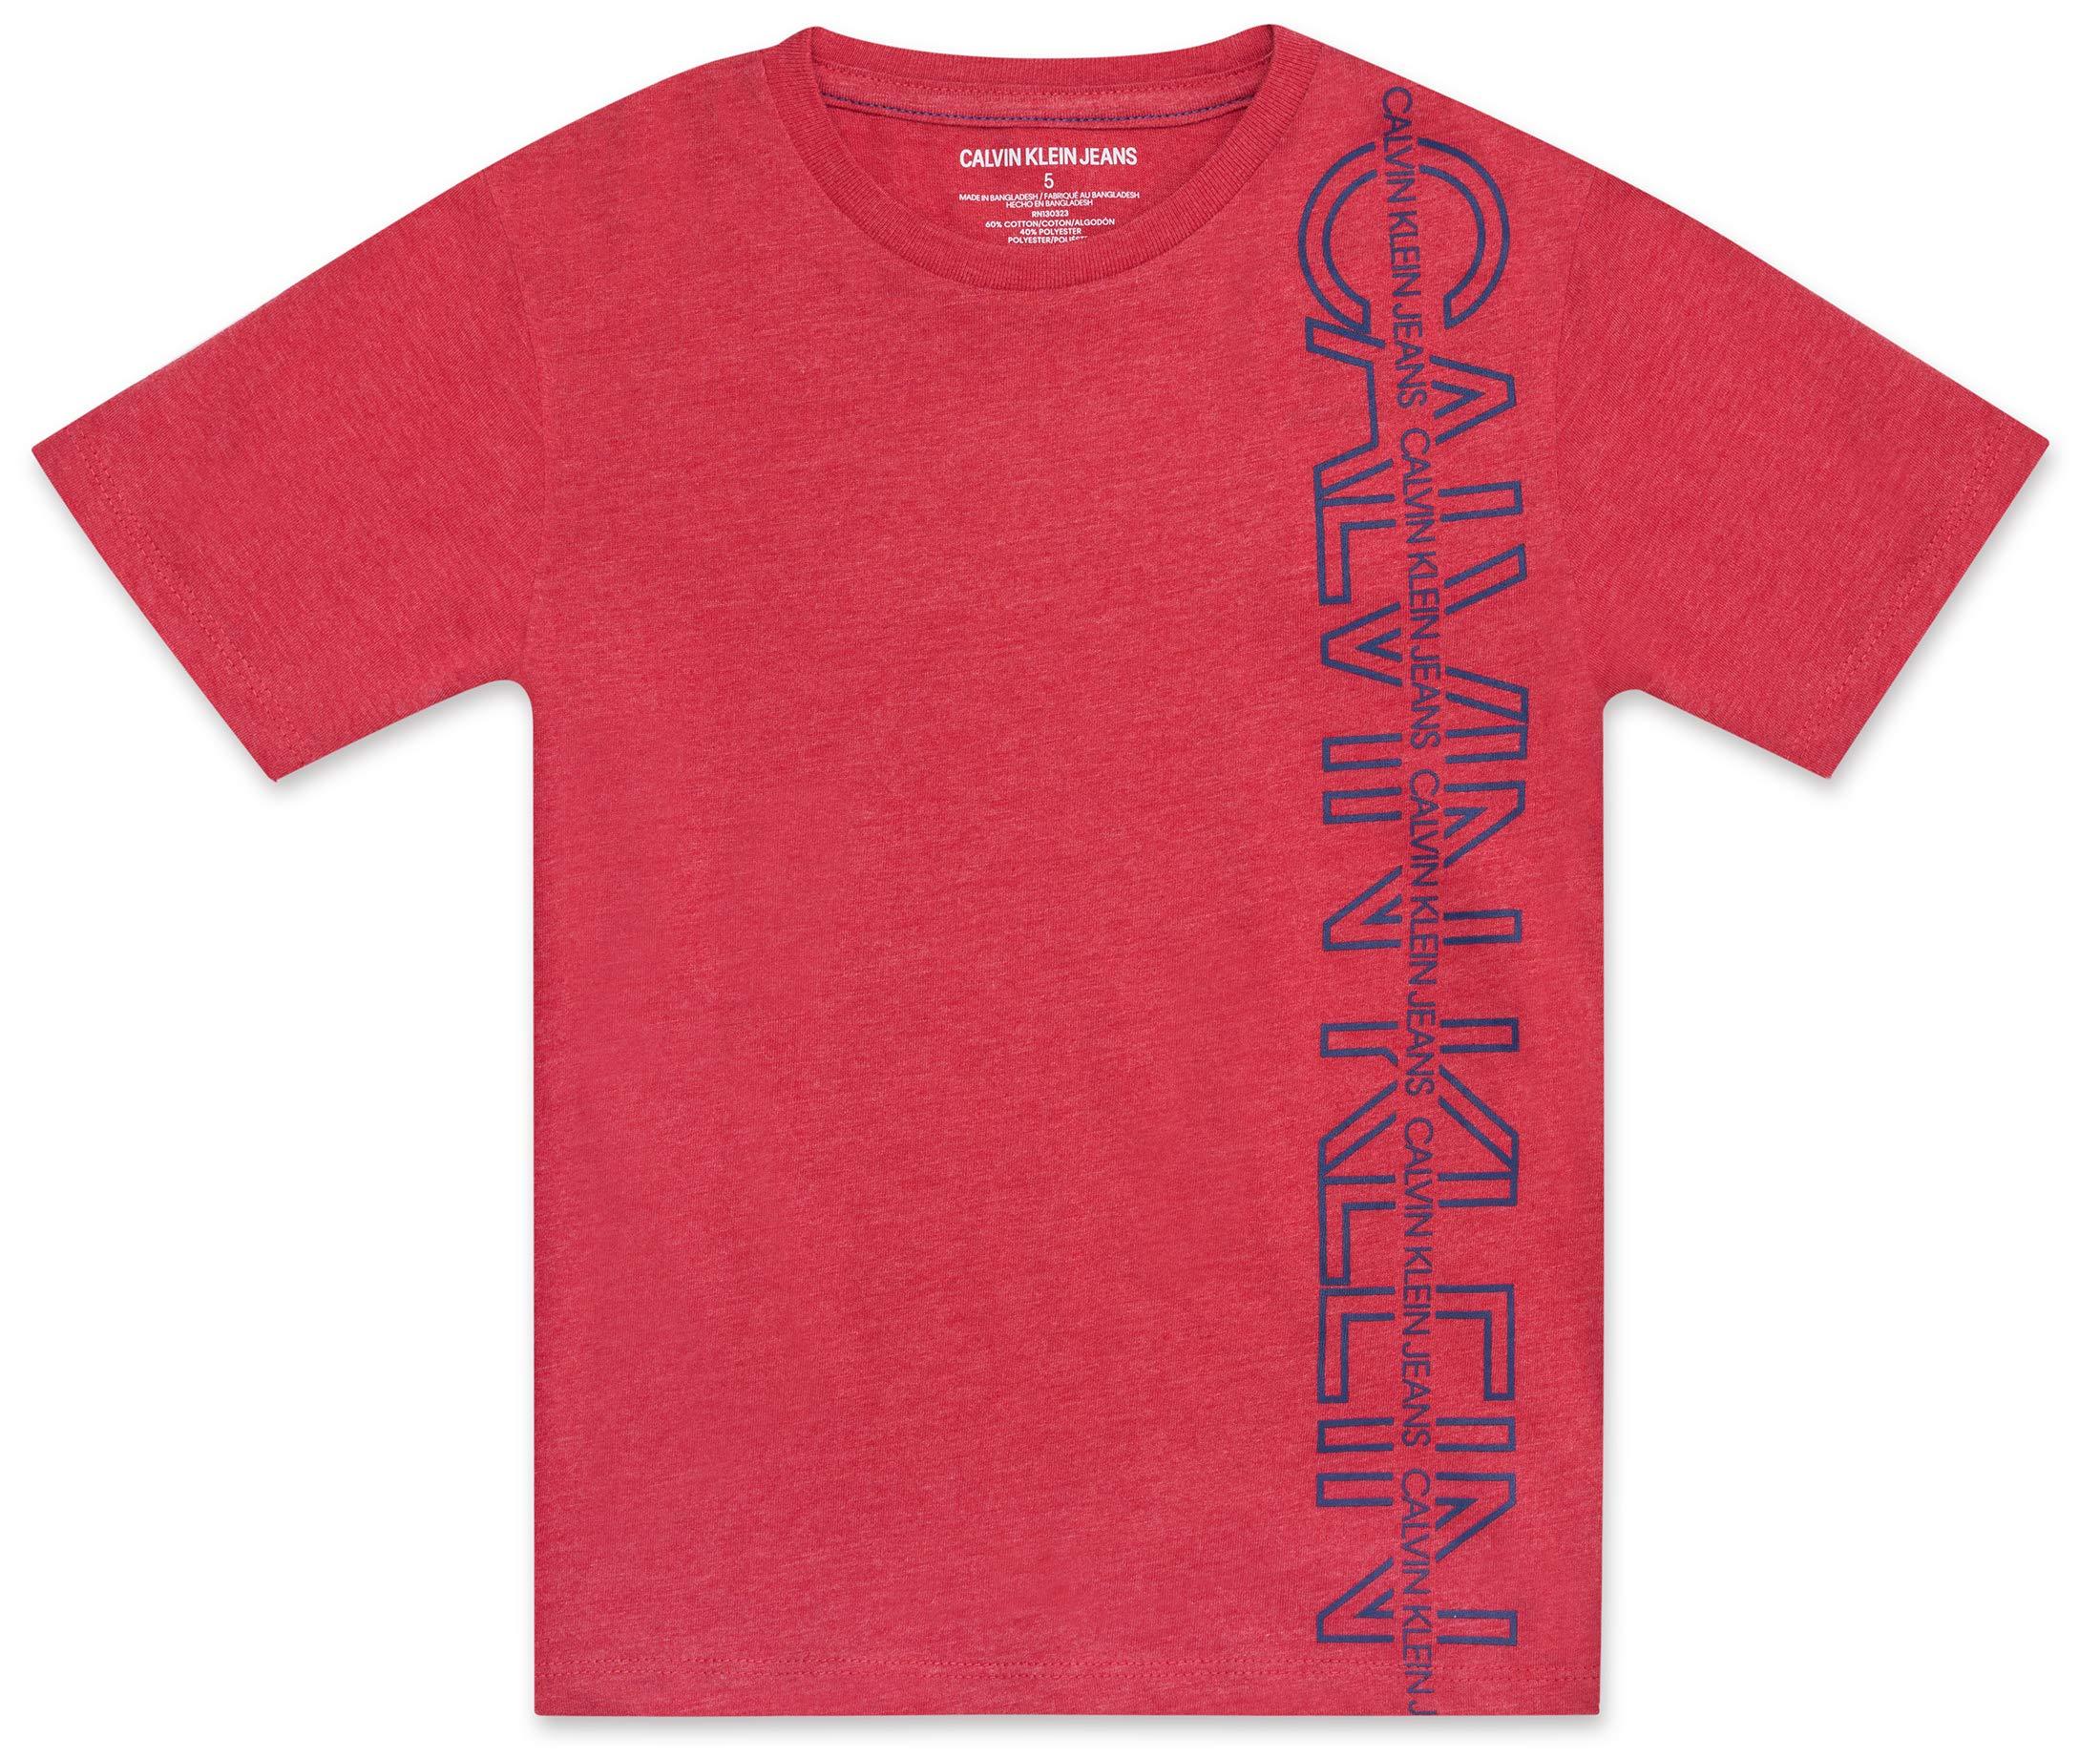 Calvin Klein Boys' Big Crew Neck Tee Shirt, red Heather, Medium (10/12)